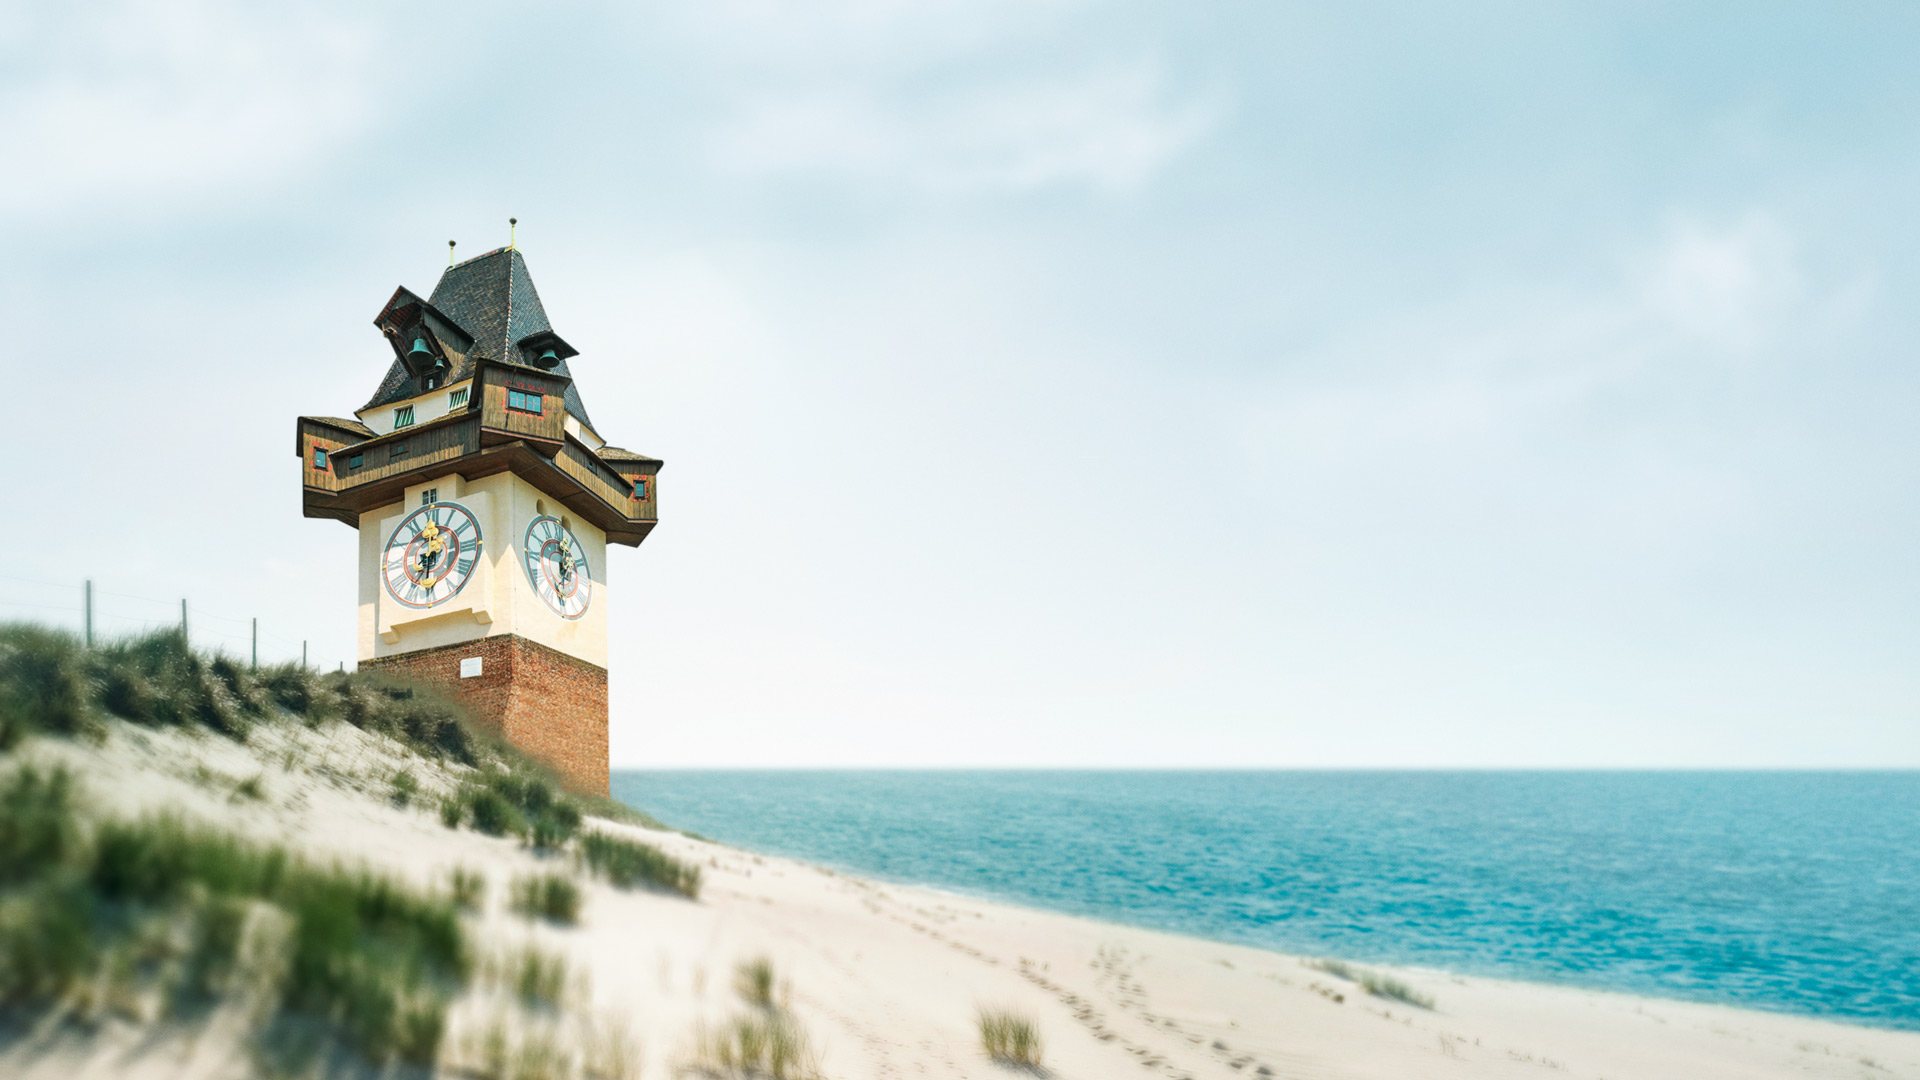 Grazer Uhrturm am Strand